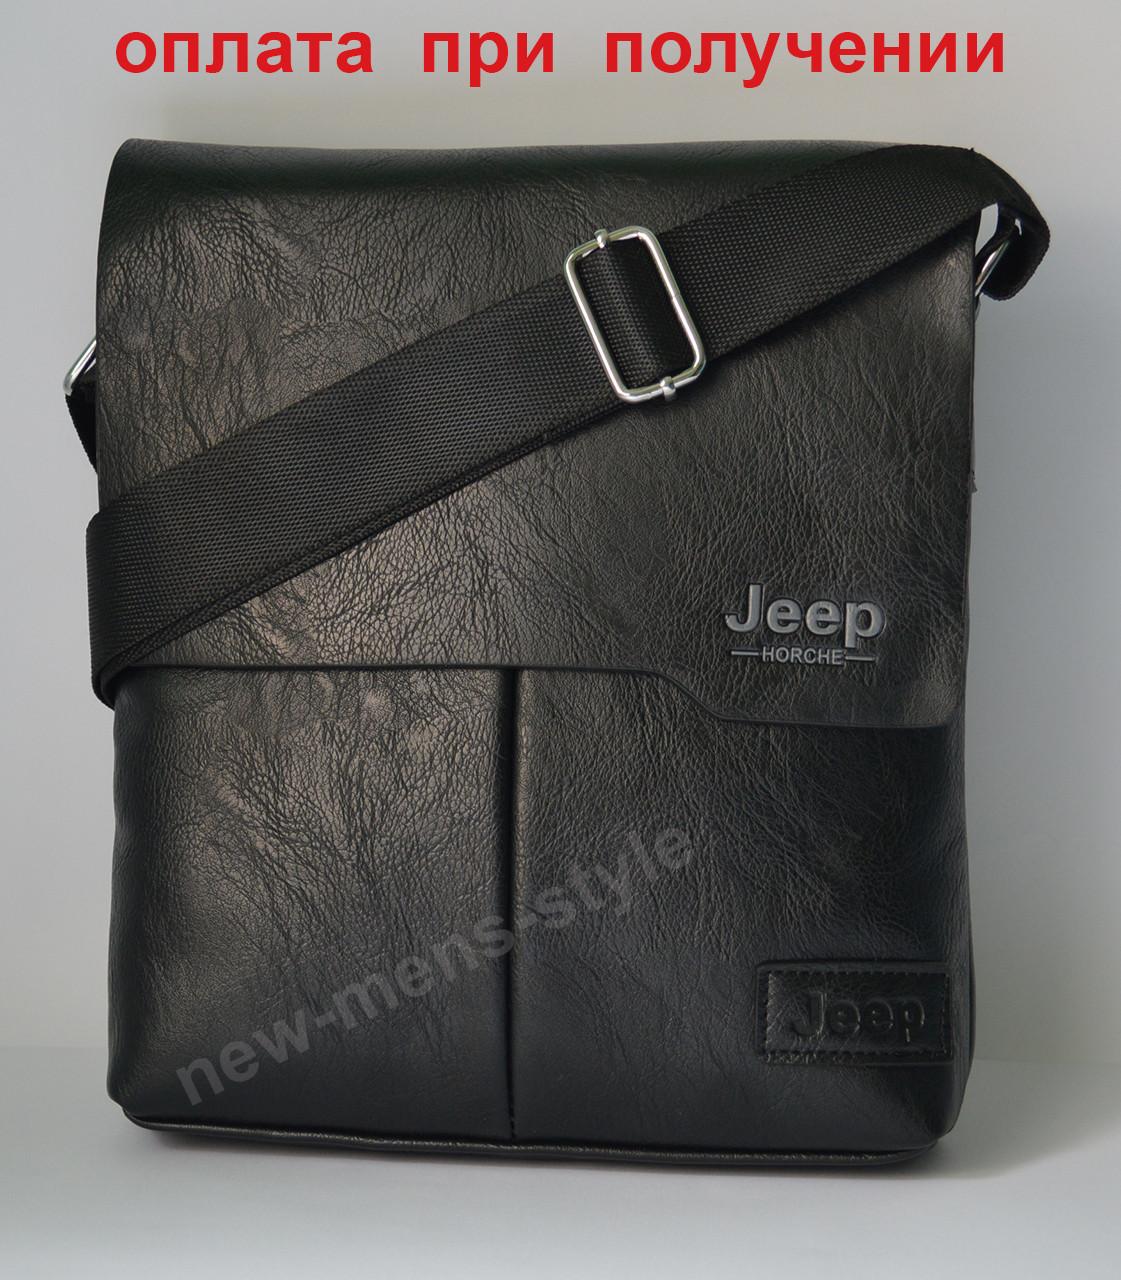 1cdaffe3bbf0 Мужская фирменная кожаная сумка через плечо Jeep buluo NEW ...